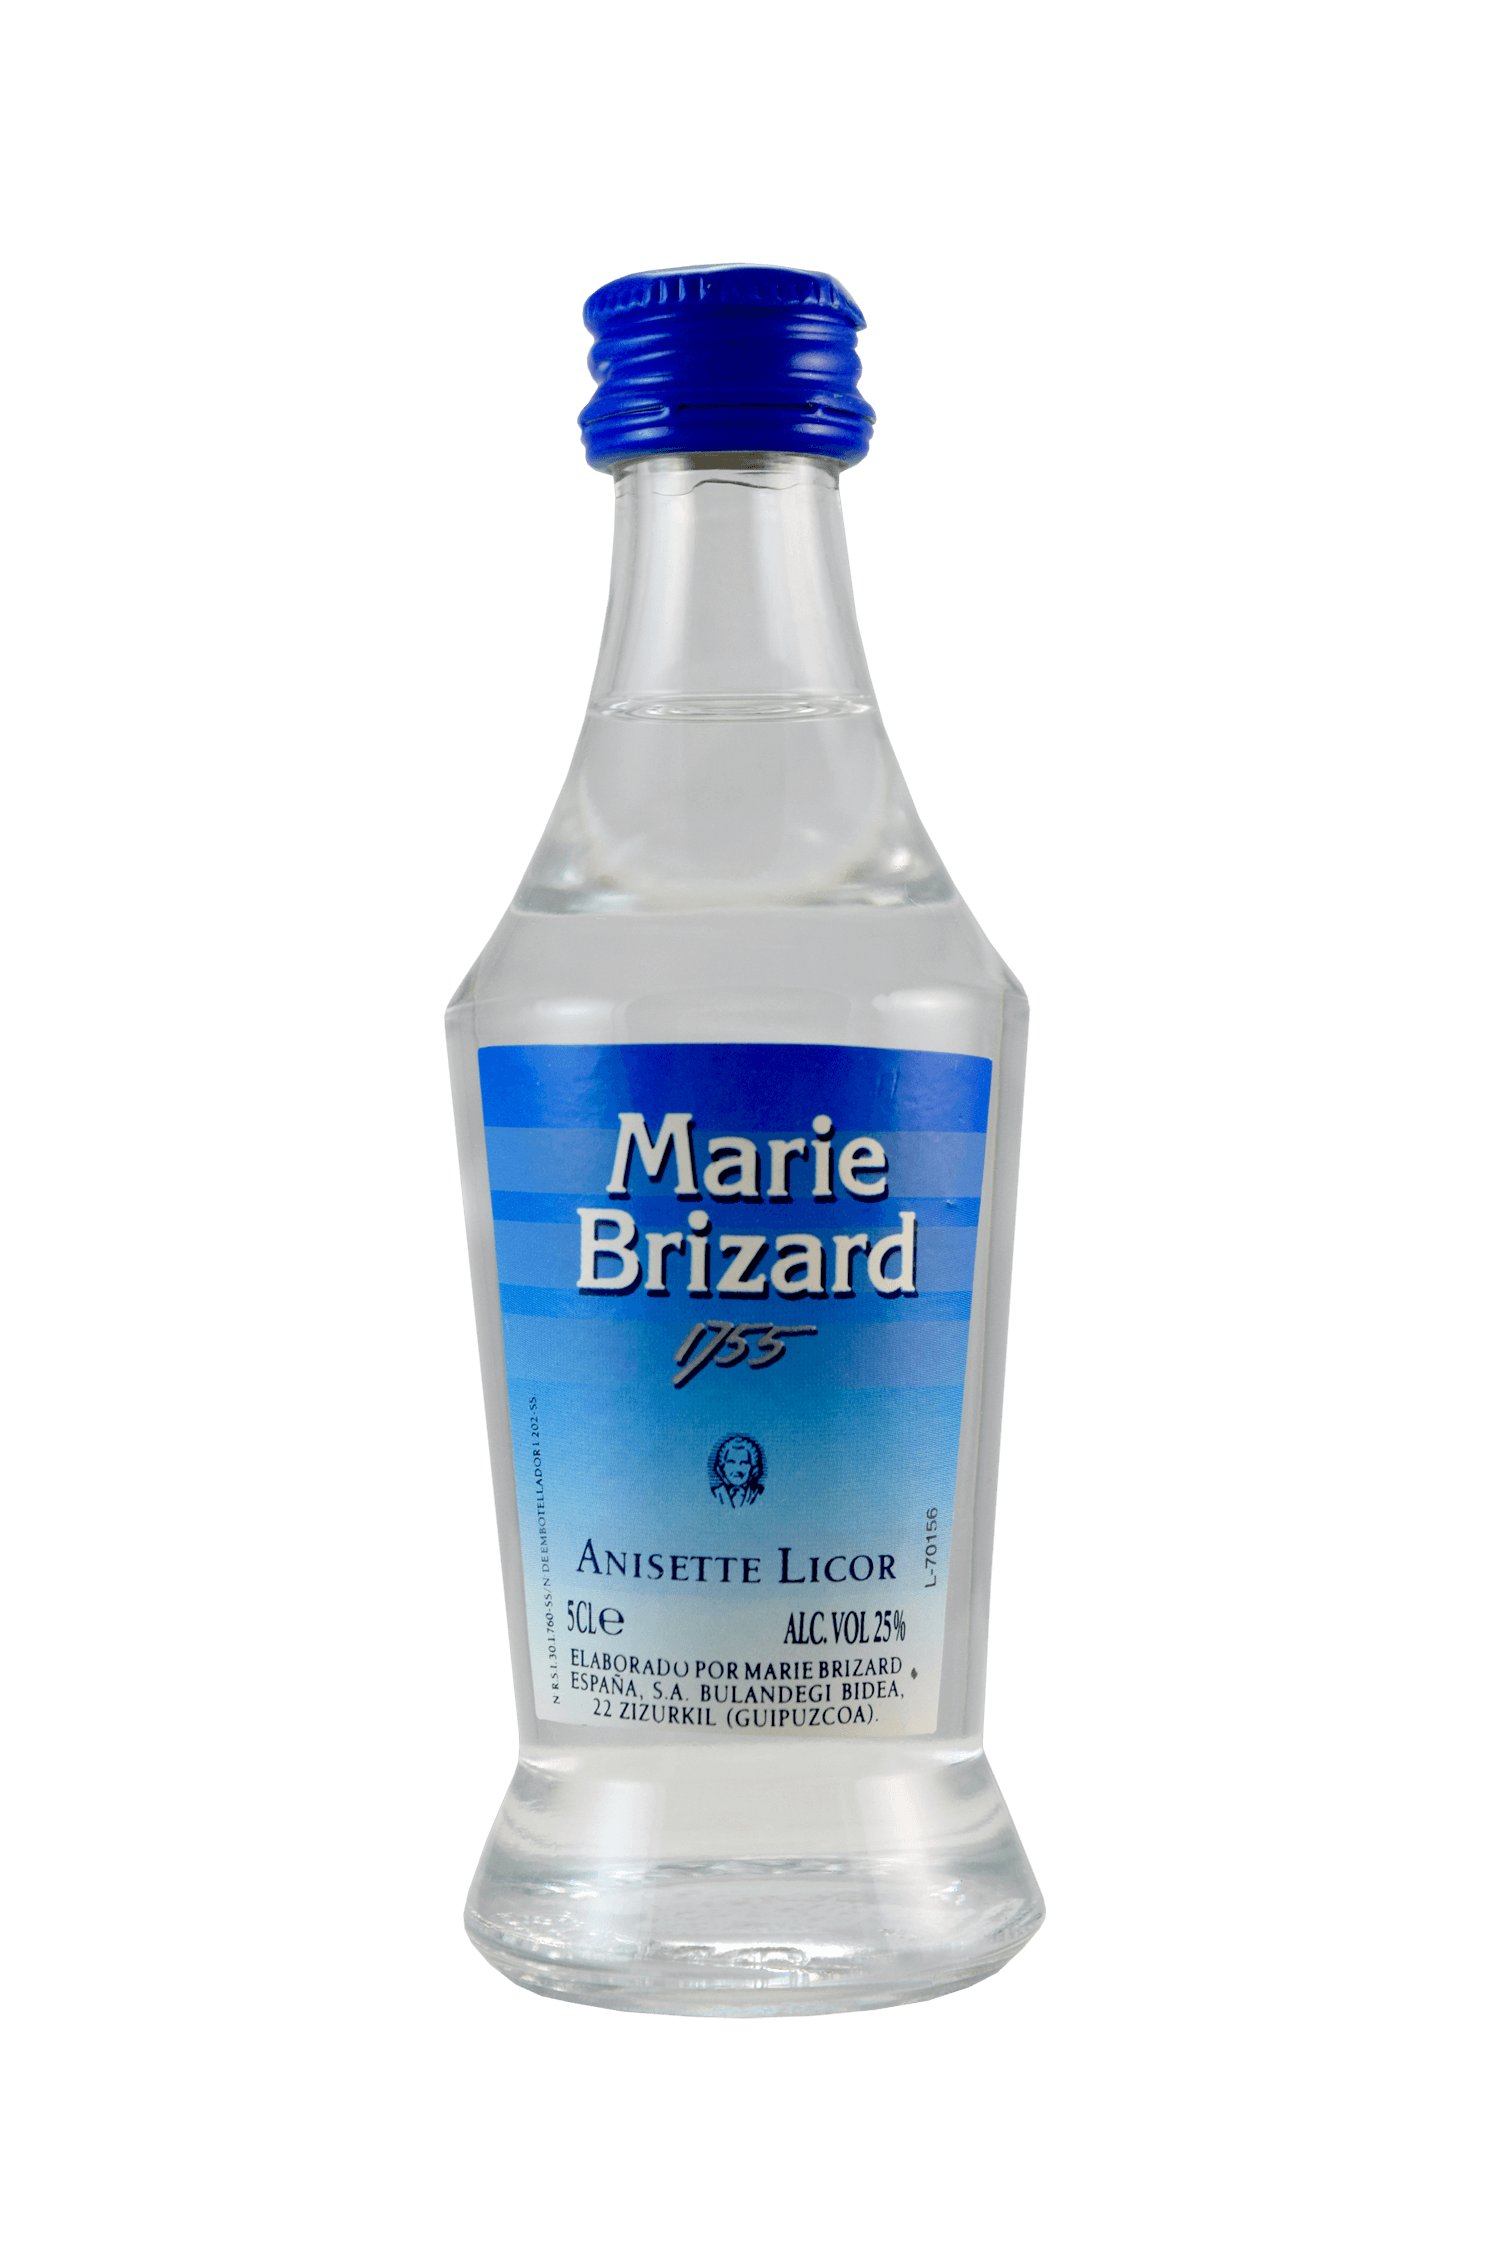 Marie Brizard Anisette Licor